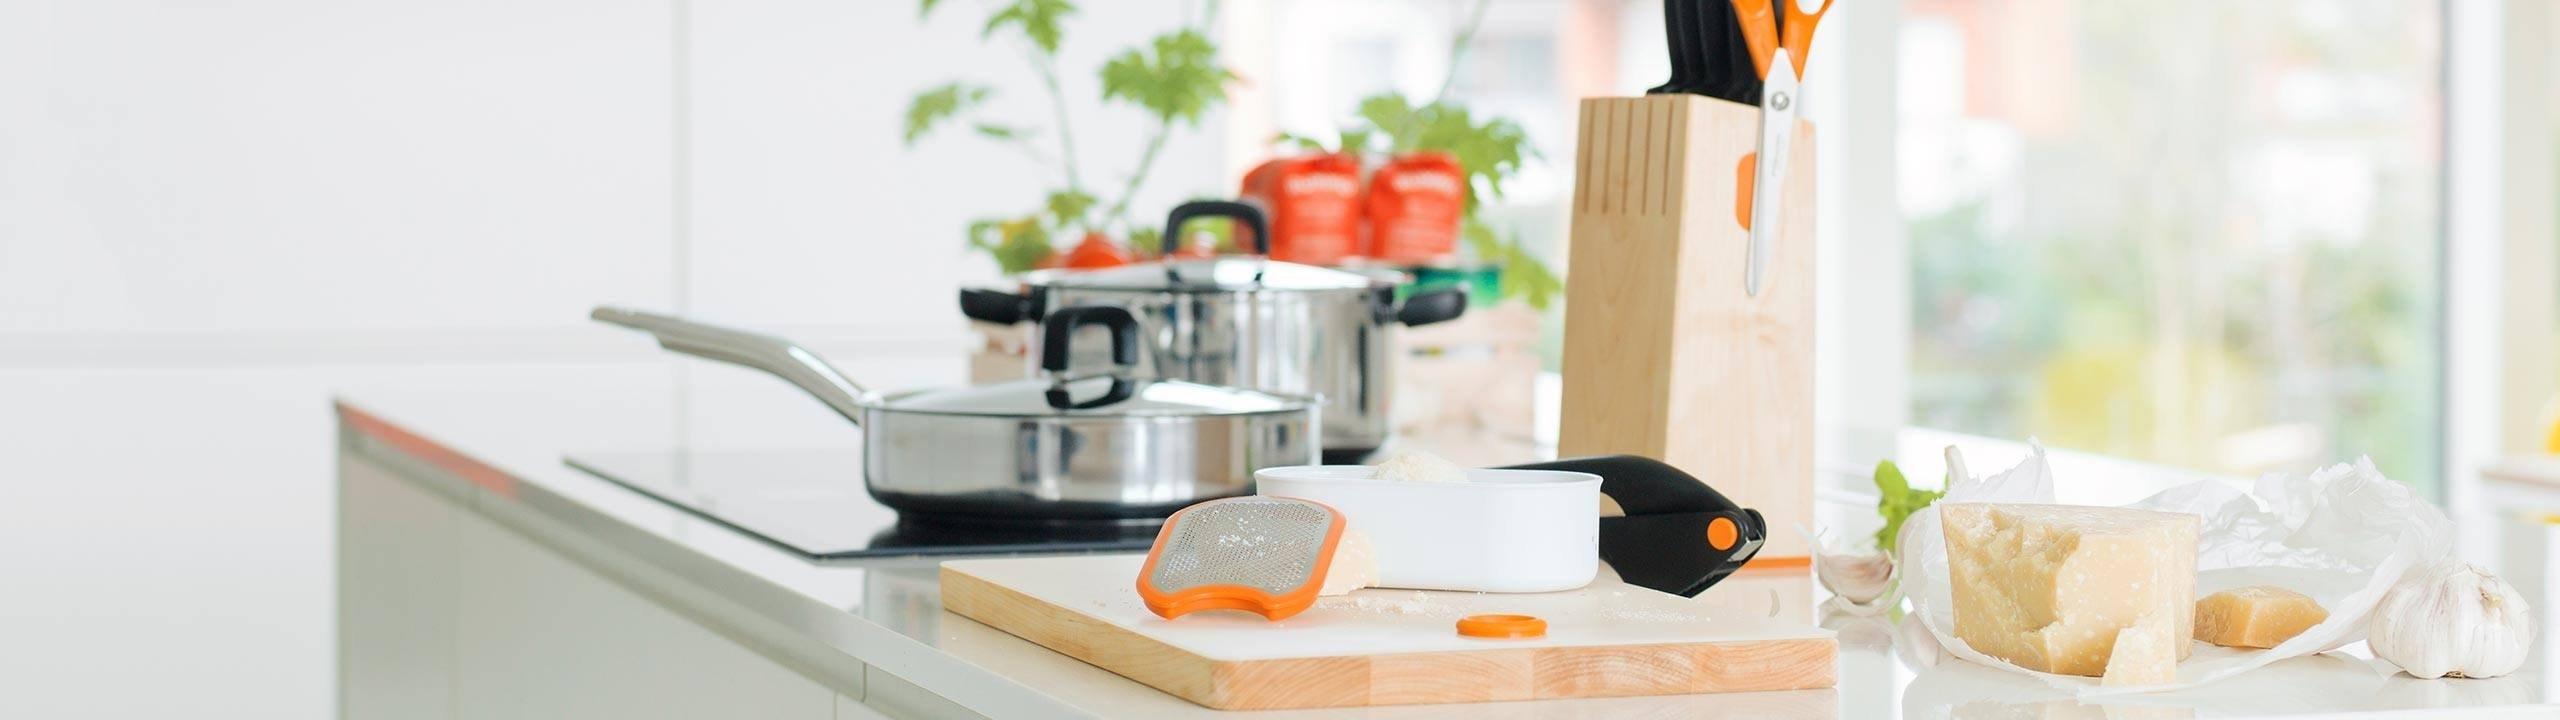 Cucina attrezzi da cucina per cucinare con facilit - Attrezzi da cucina per dolci ...